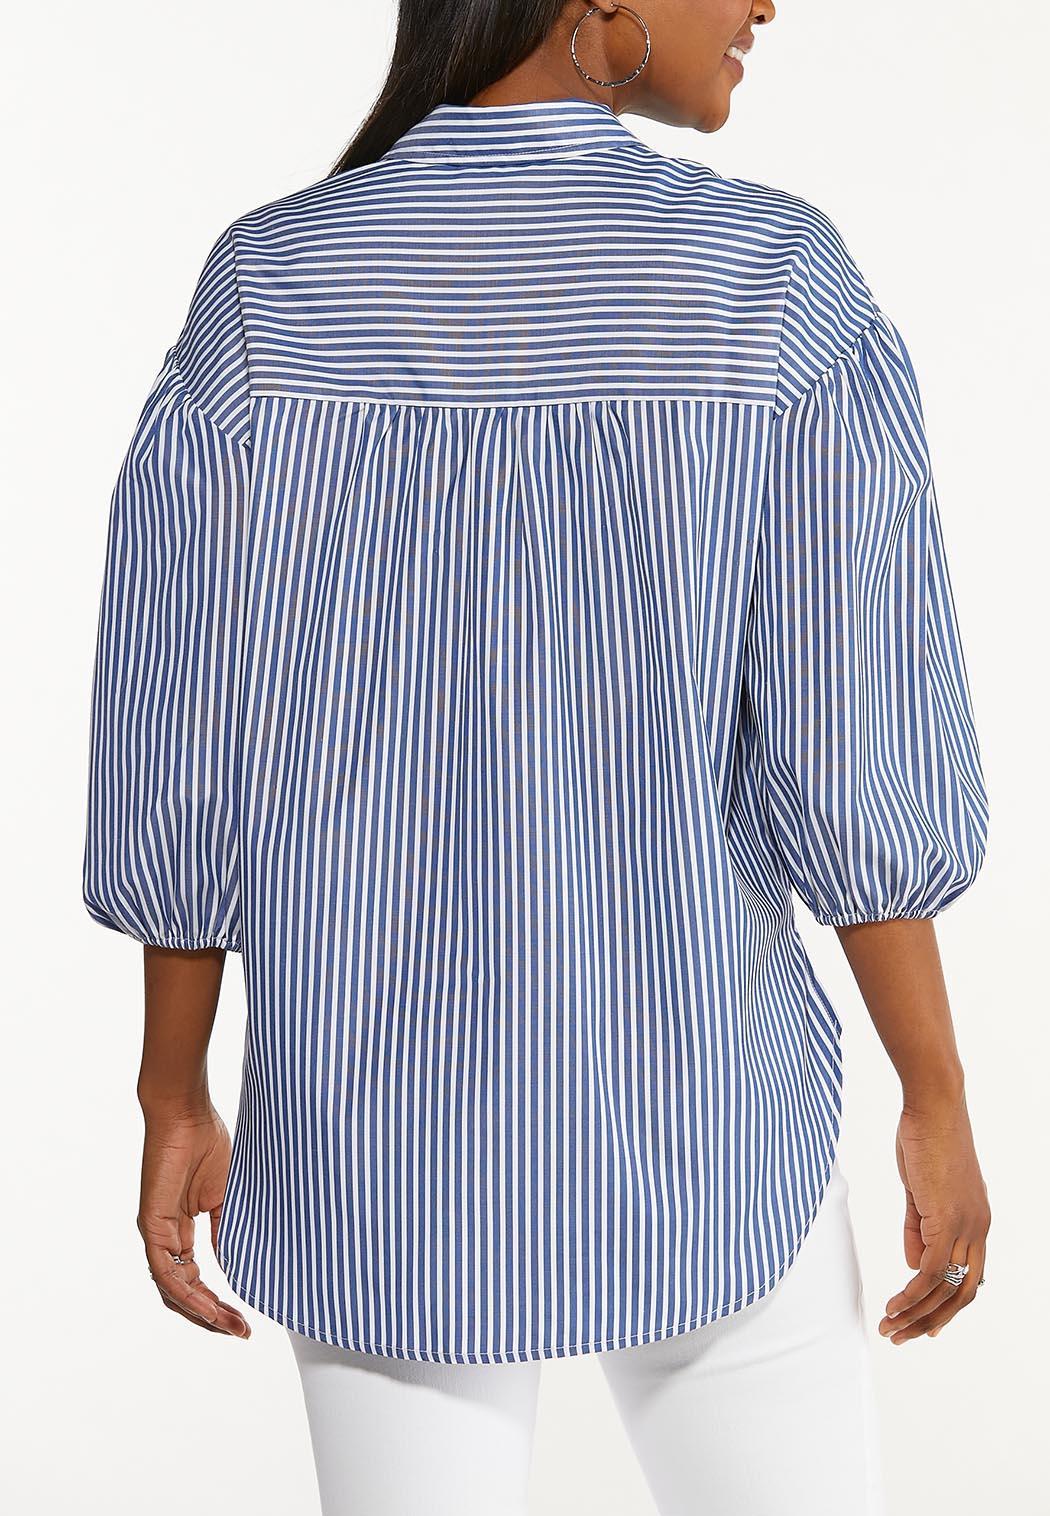 Stripe Puff Sleeve Top (Item #44517561)